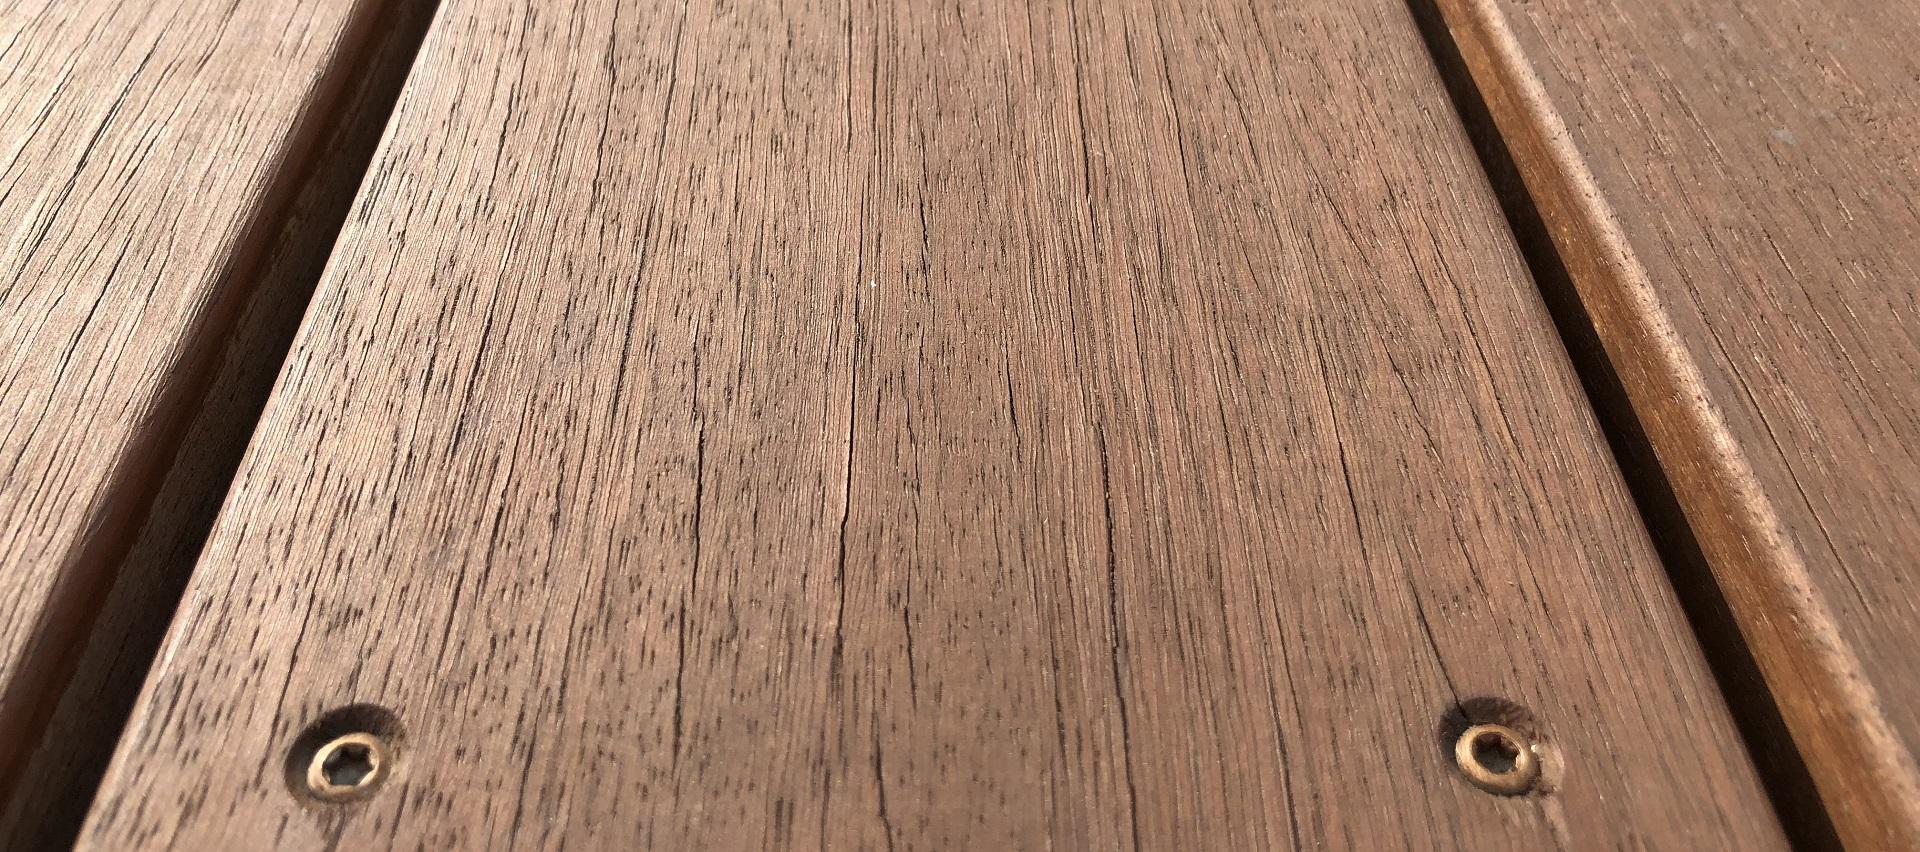 Terrassendielen aus Holz bei Holz-Hauff